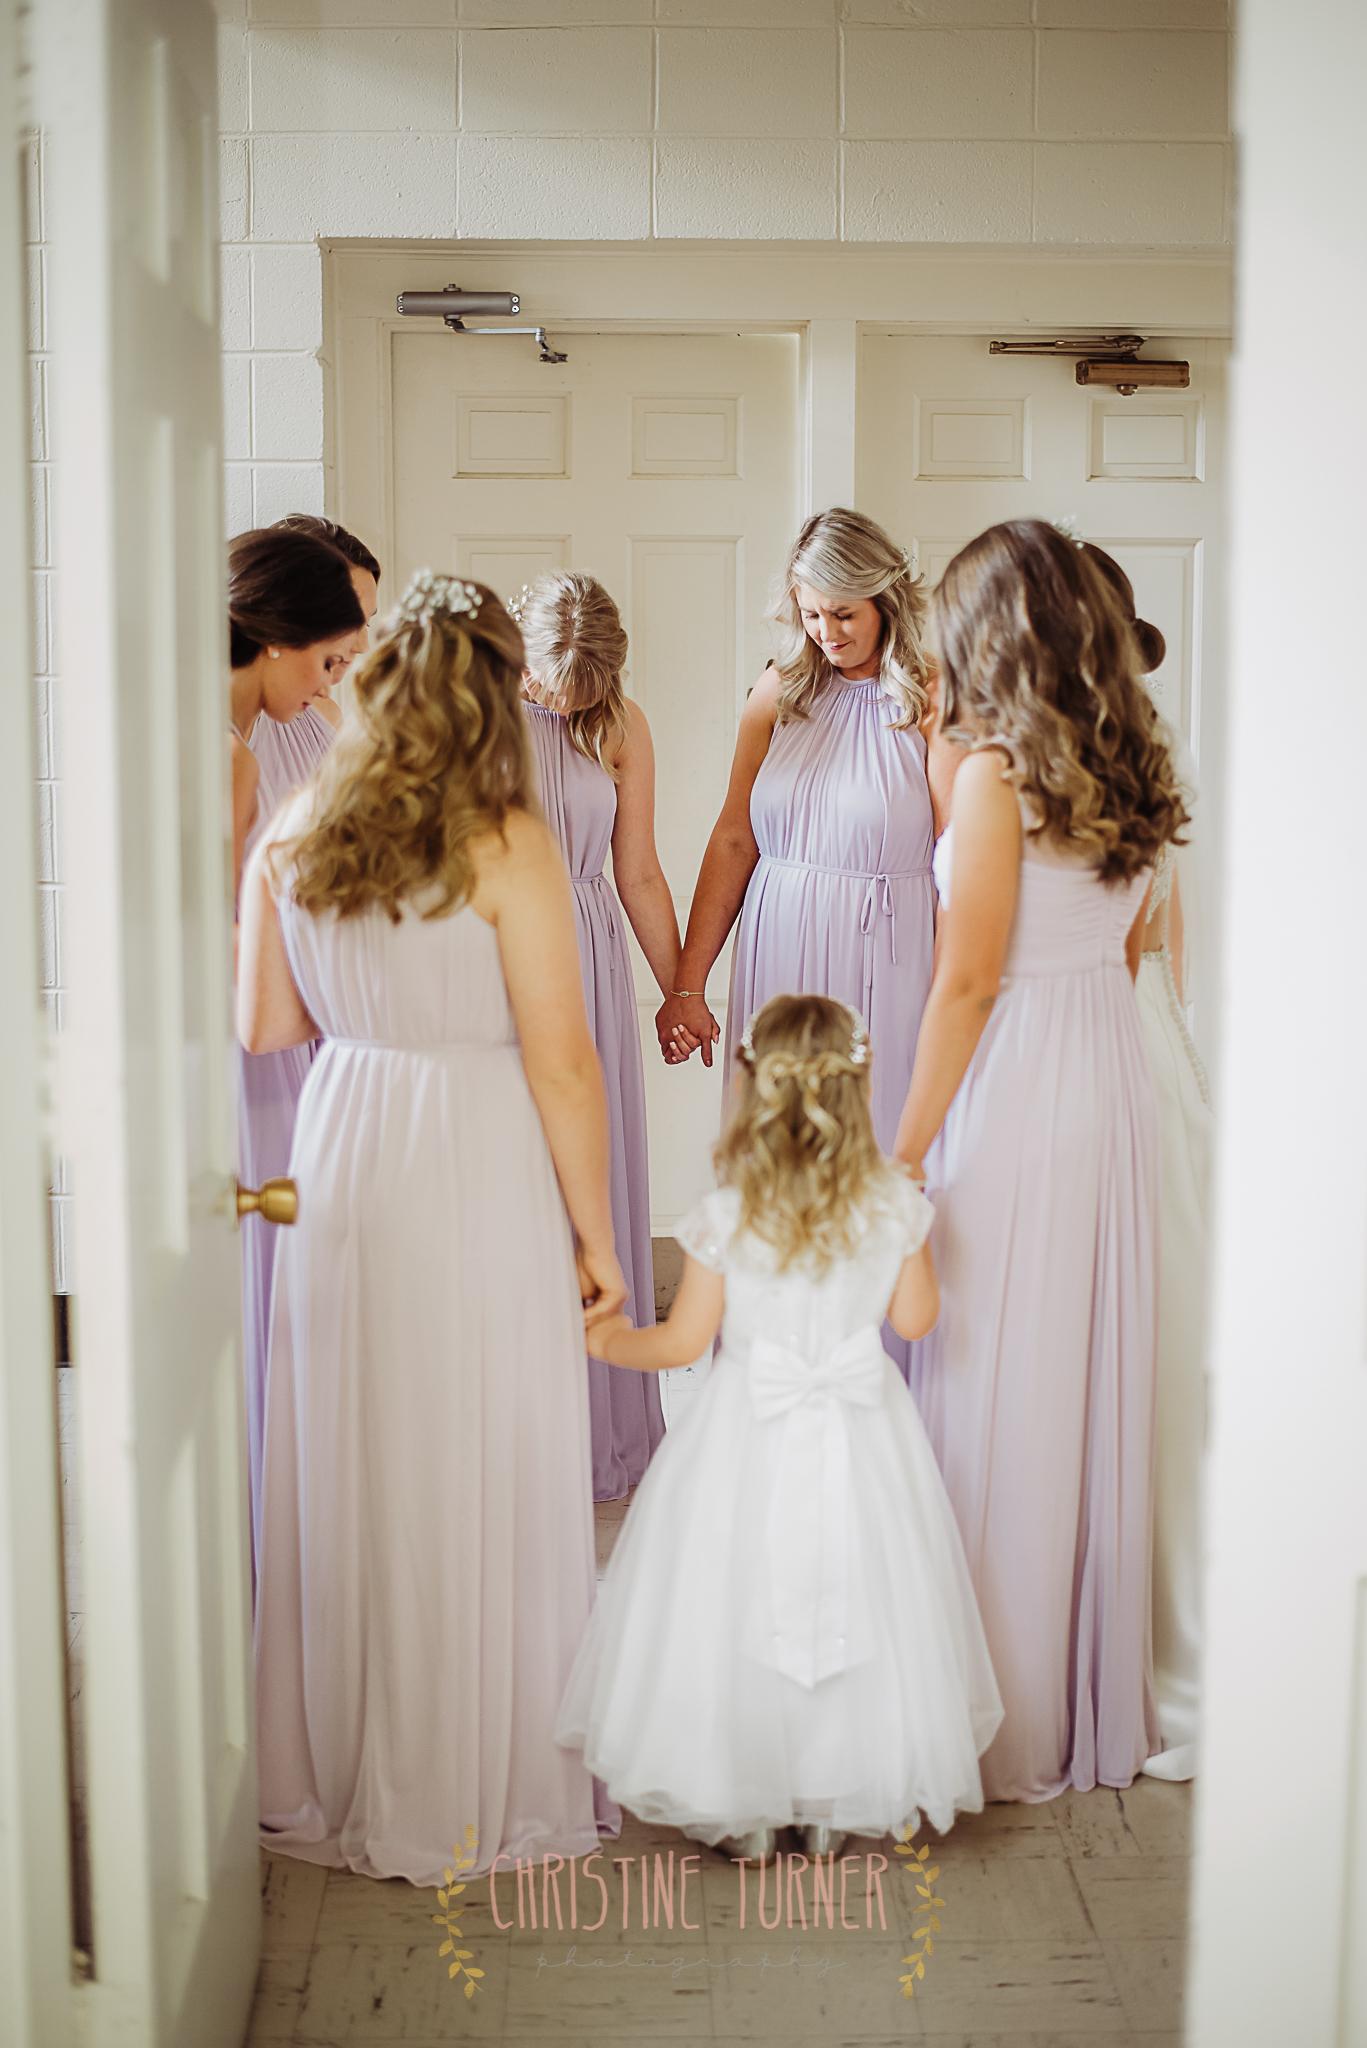 Johnston Wedding (4 of 4)